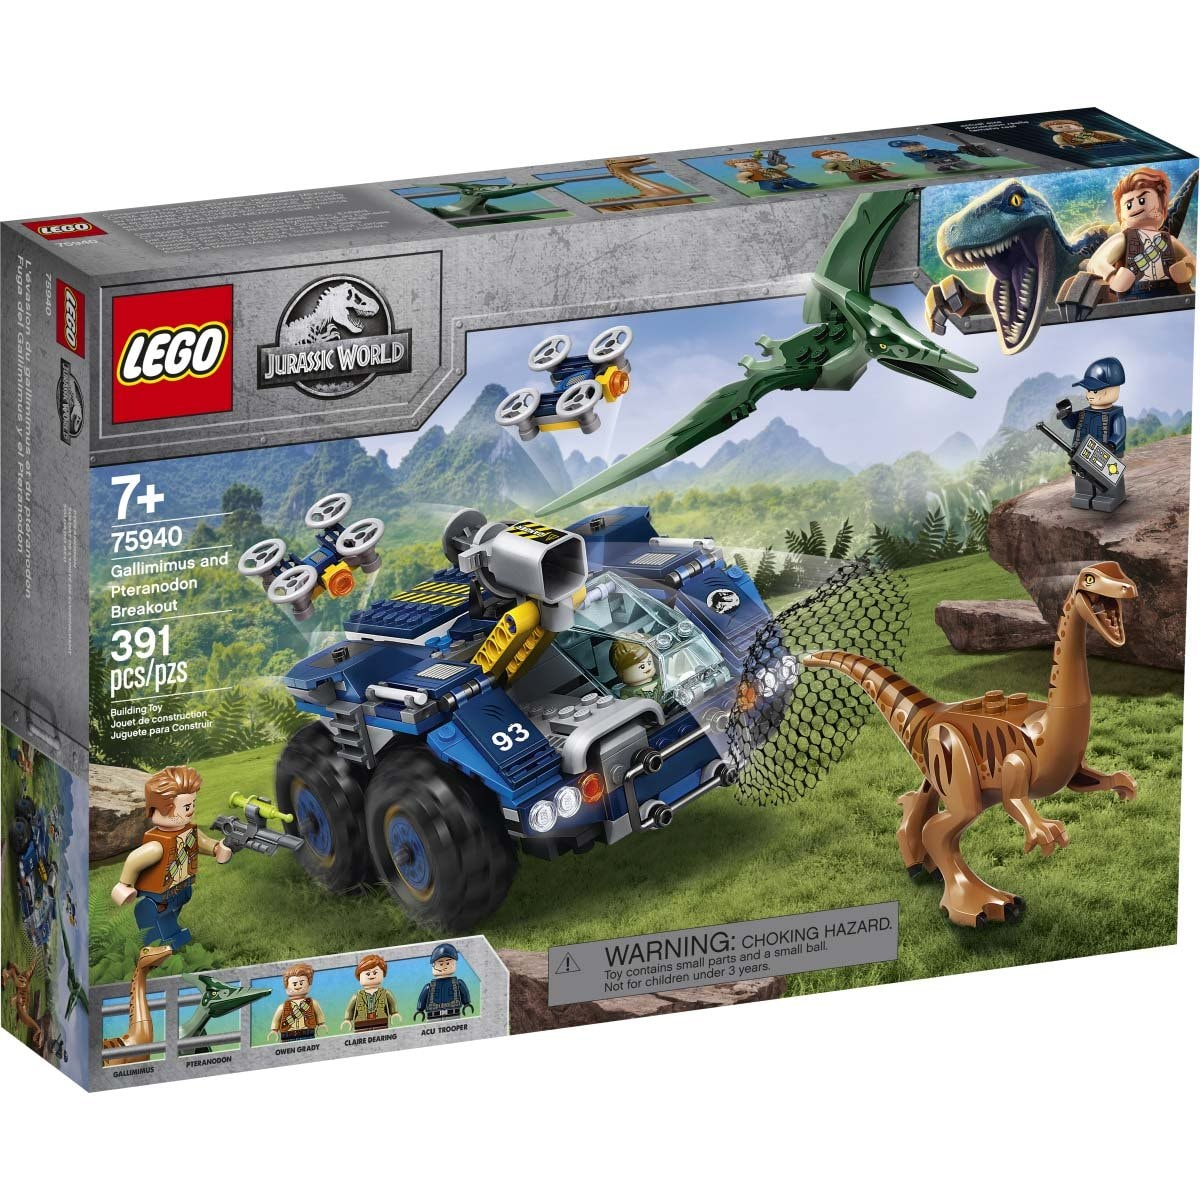 Fuga Del Gallimimus Y el Pteranodon Lego Jurassic World